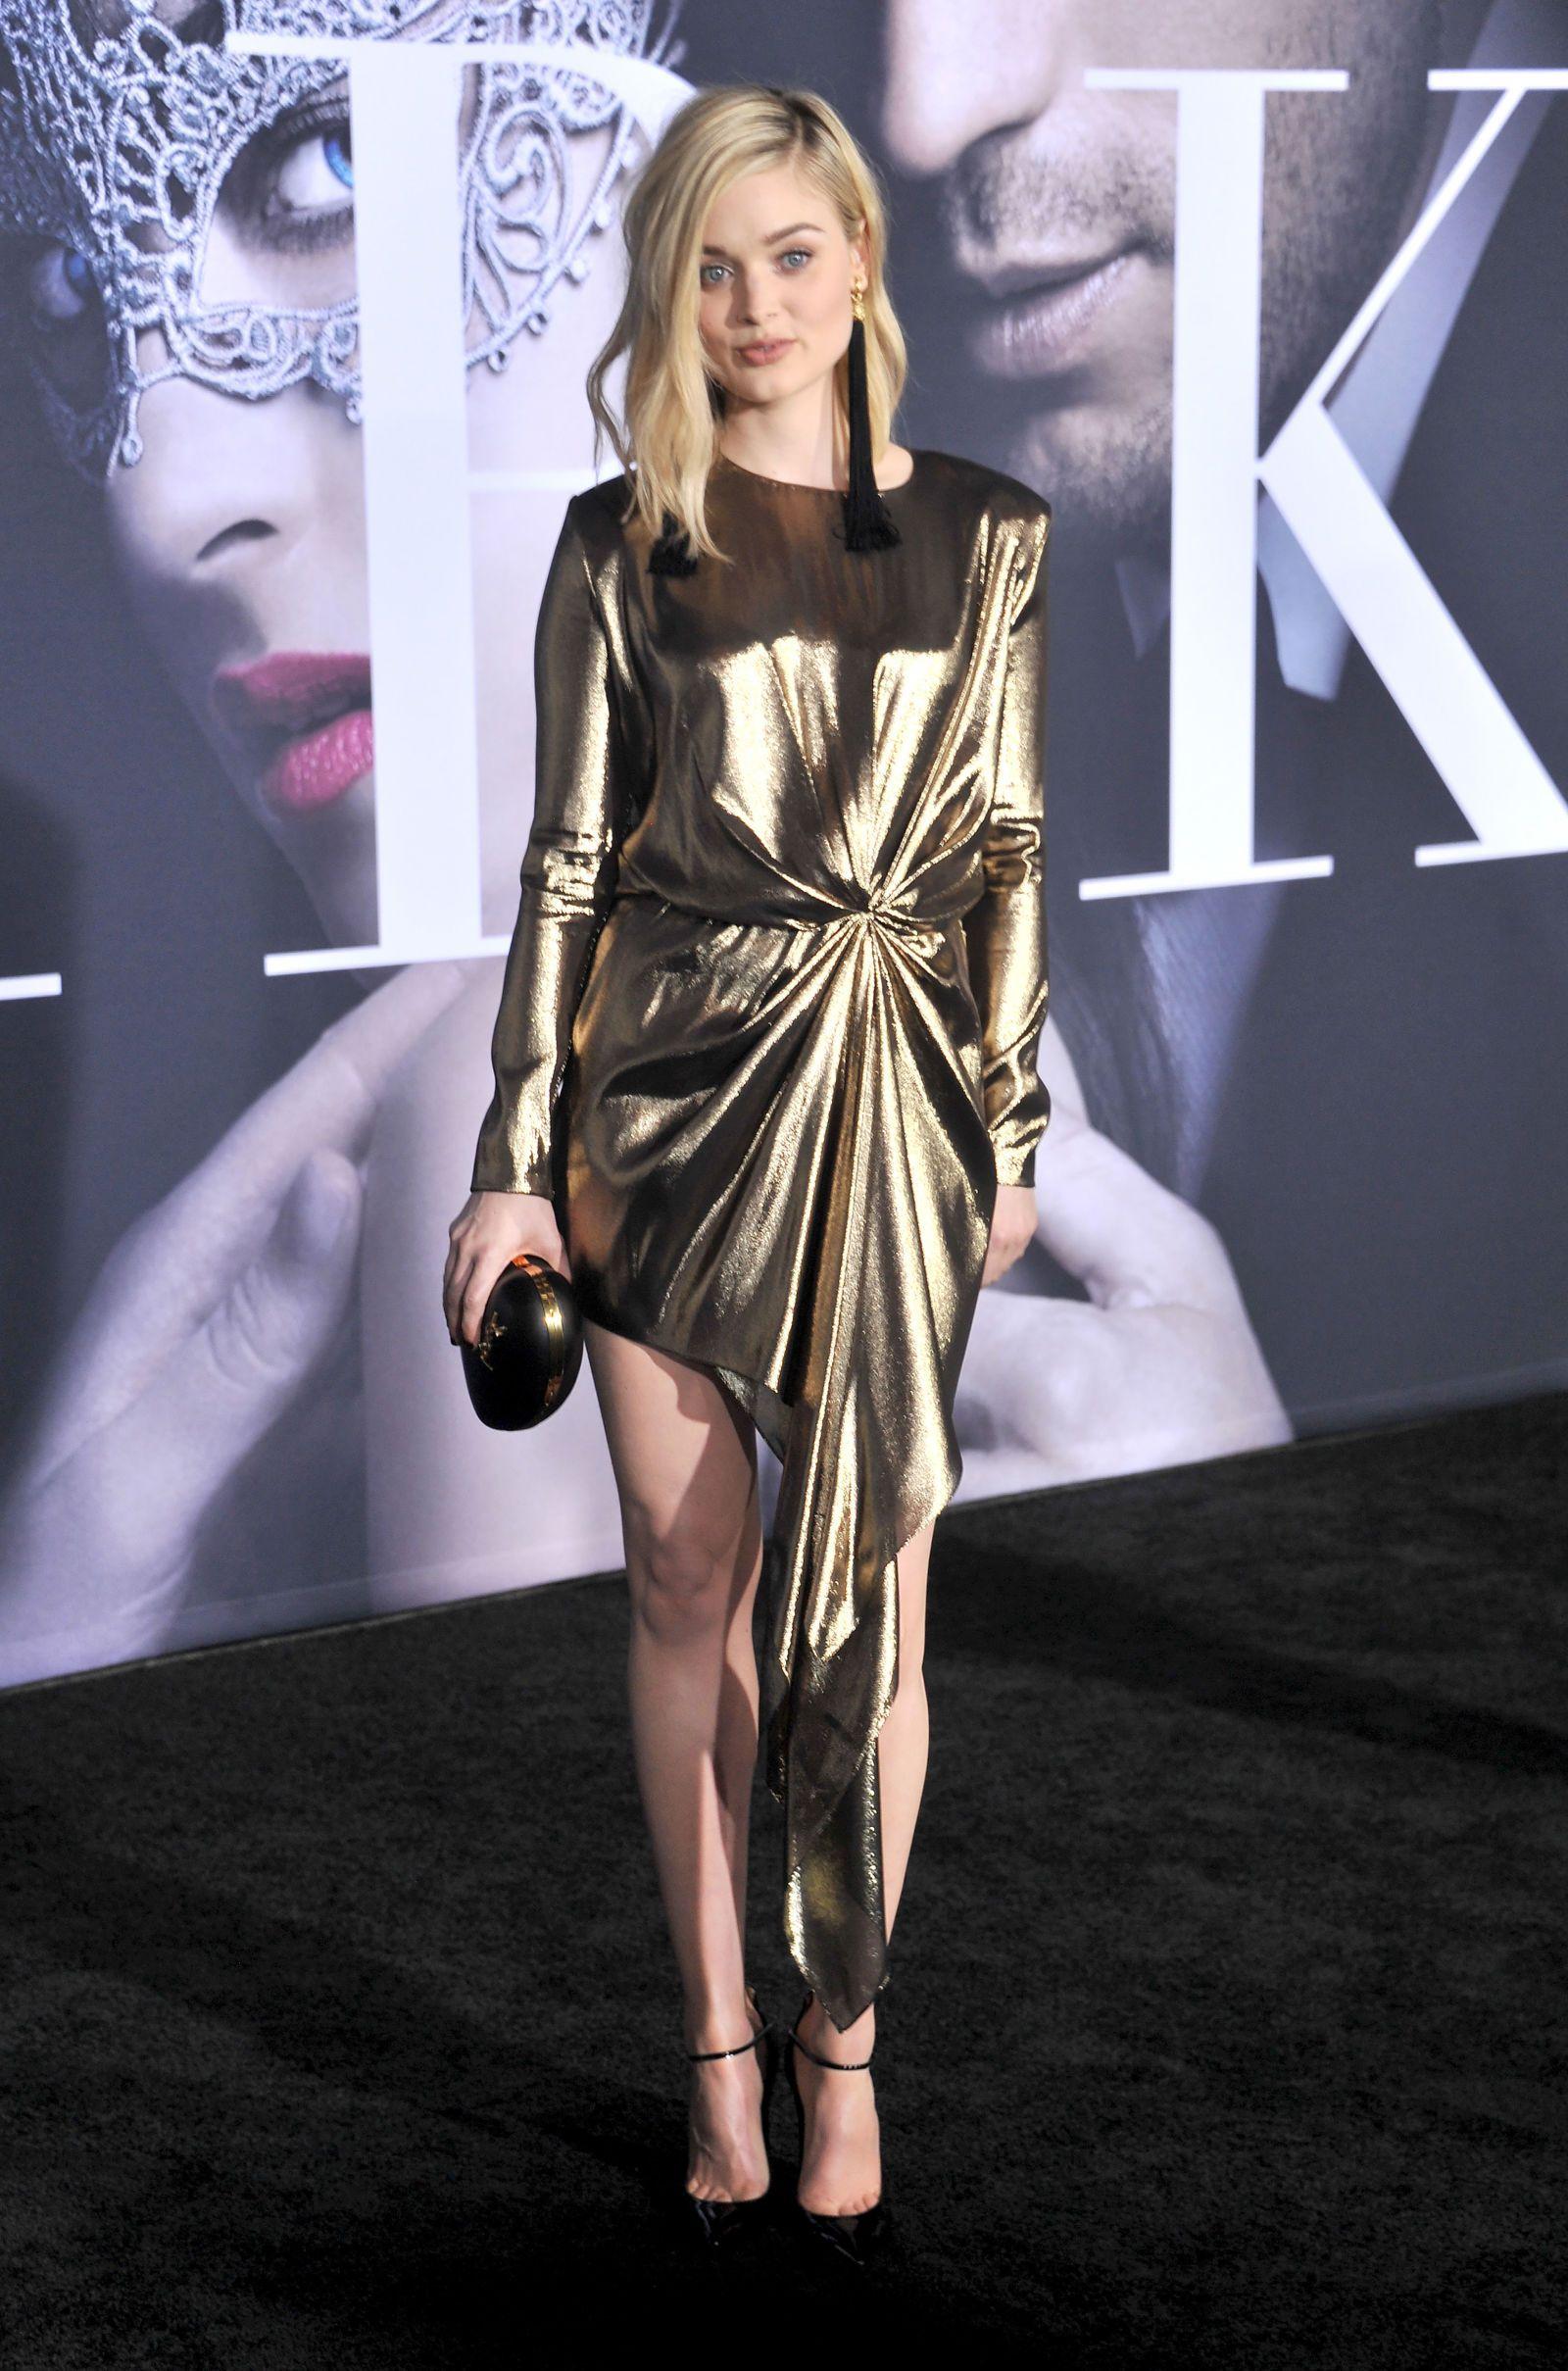 Dakota Johnson Wears Silk Sheets, A Lot Of Boob Tape